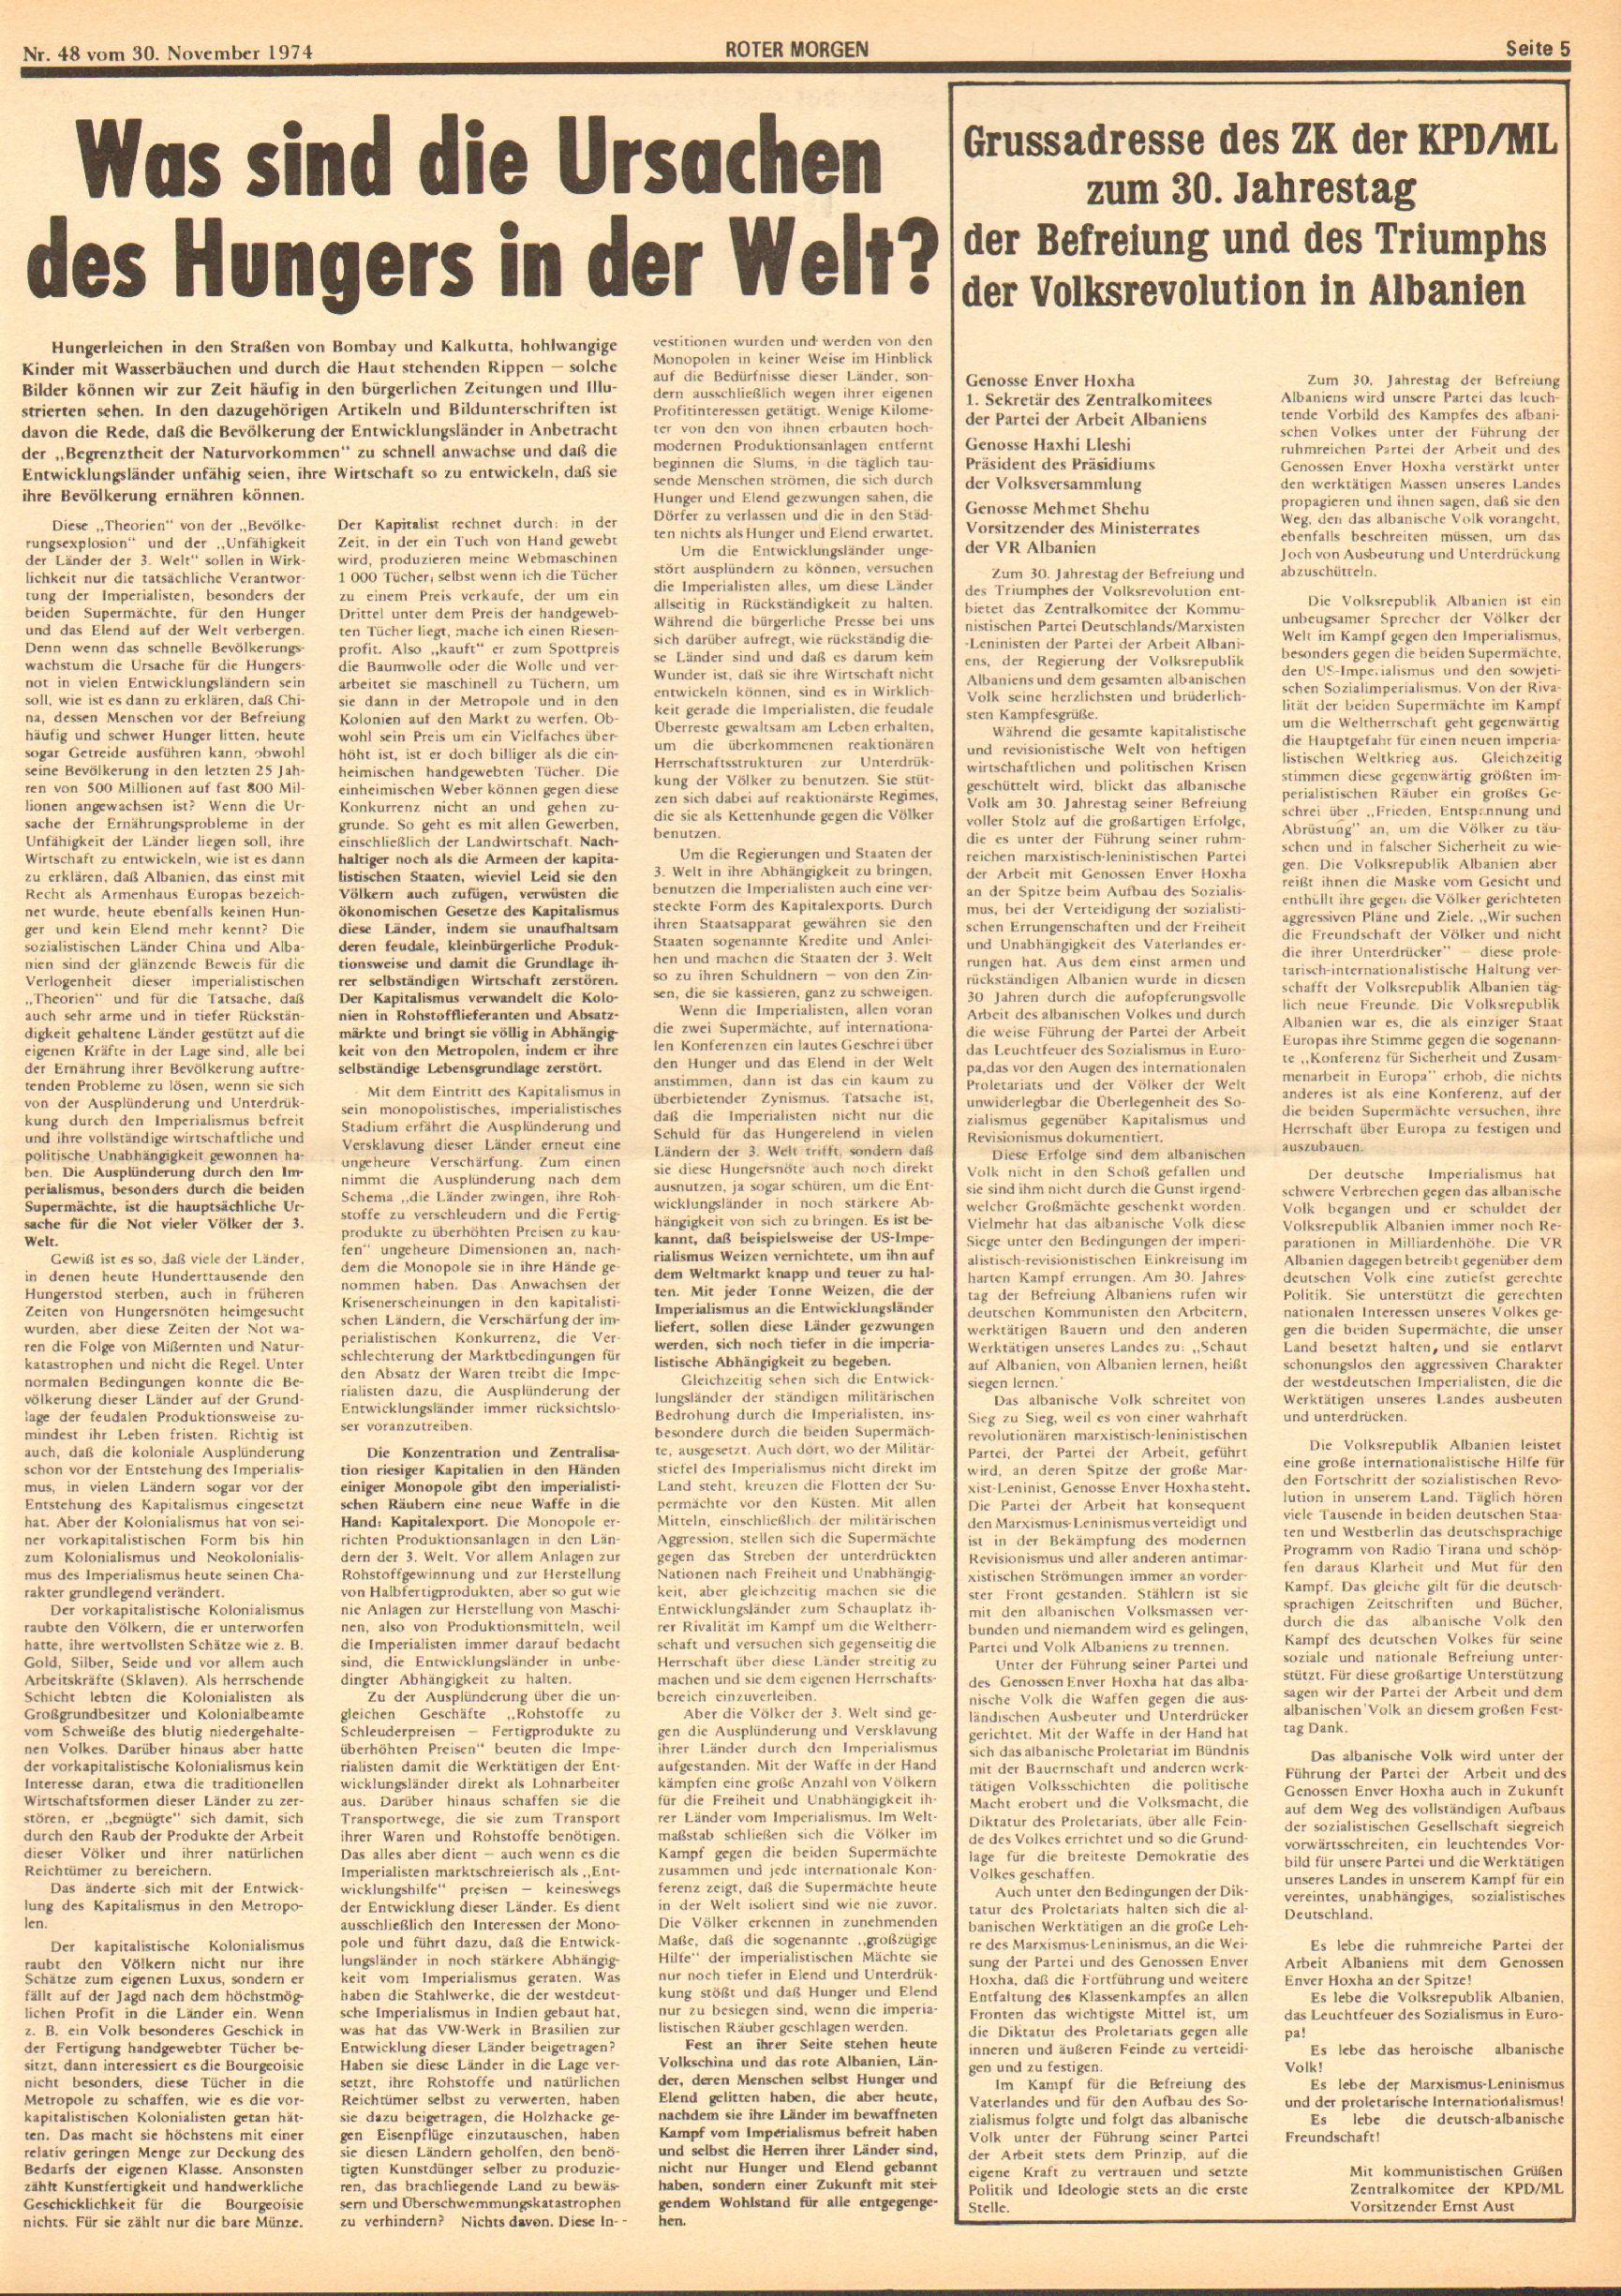 Roter Morgen, 8. Jg., 30. November 1974, Nr. 48, Seite 5